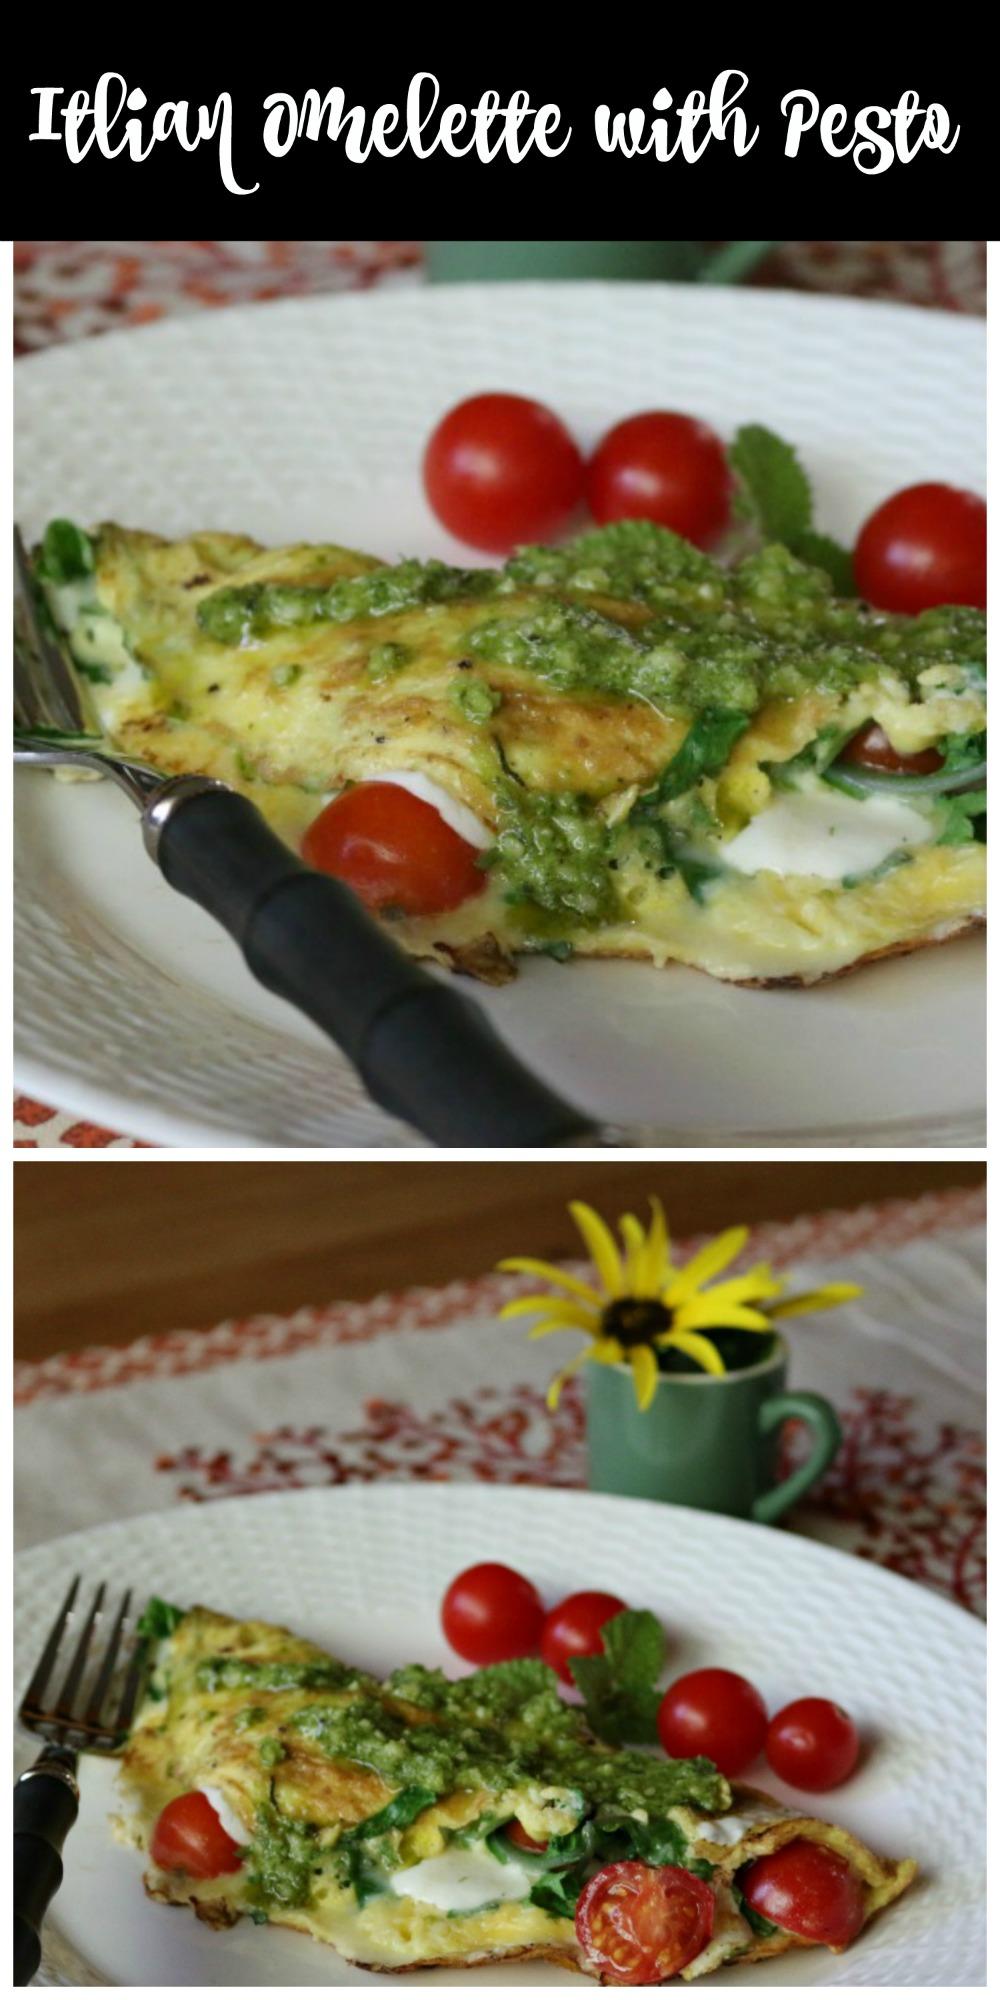 Italian Omelette with Pesto - Low Sugar Recipe Ideas from www.ceceliasgoodstuff.com